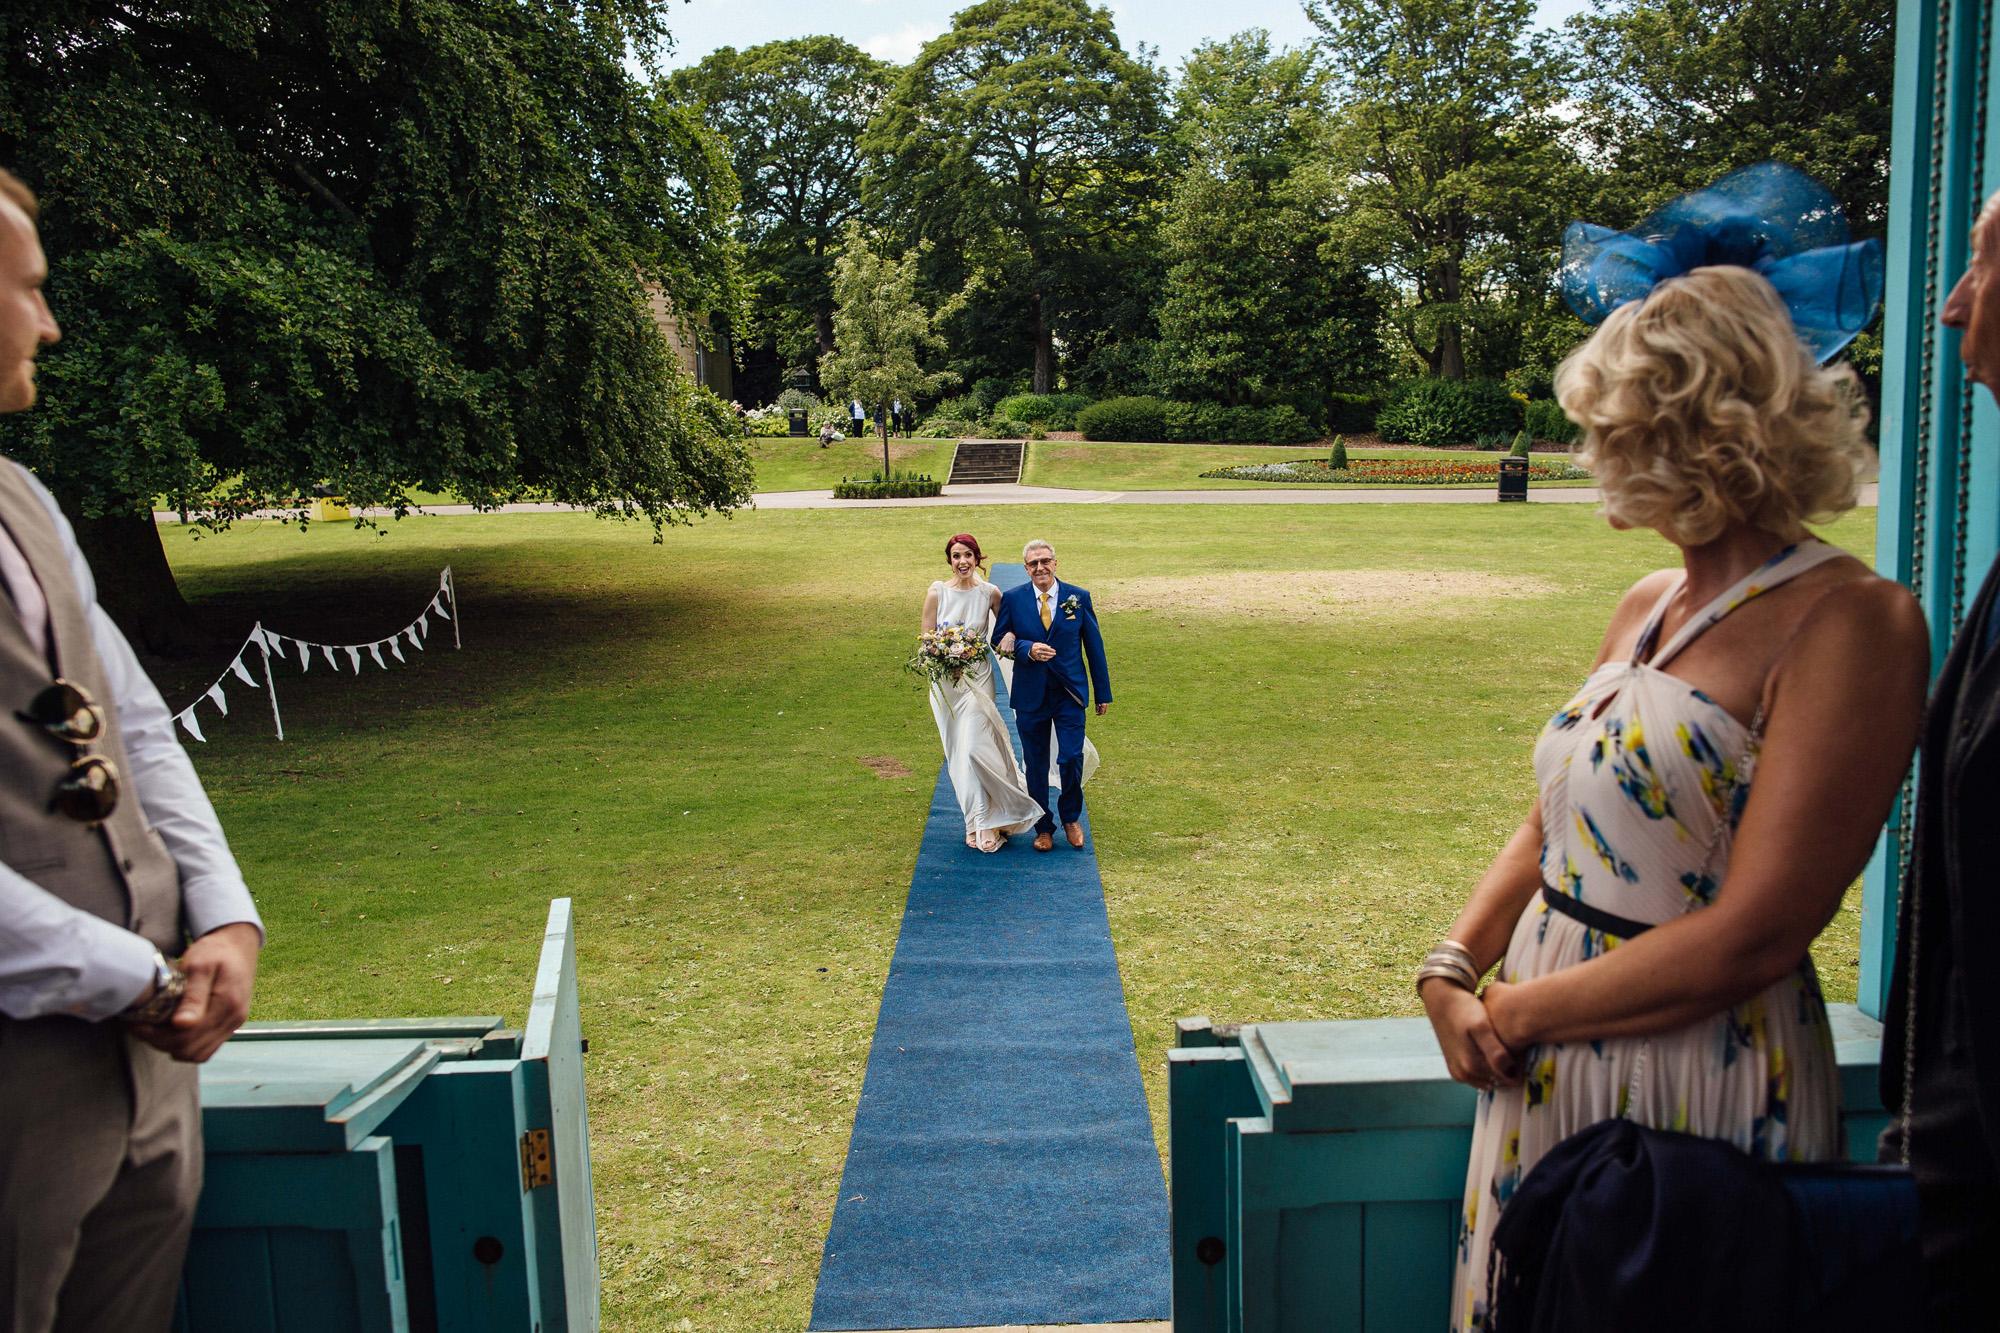 Sarah-Honeysuckle-Bias-Cut-Silk-Vintage-Inspired-Wedding-Gown-Sheffield-Wedding-Kate-Beaumont-10.jpg